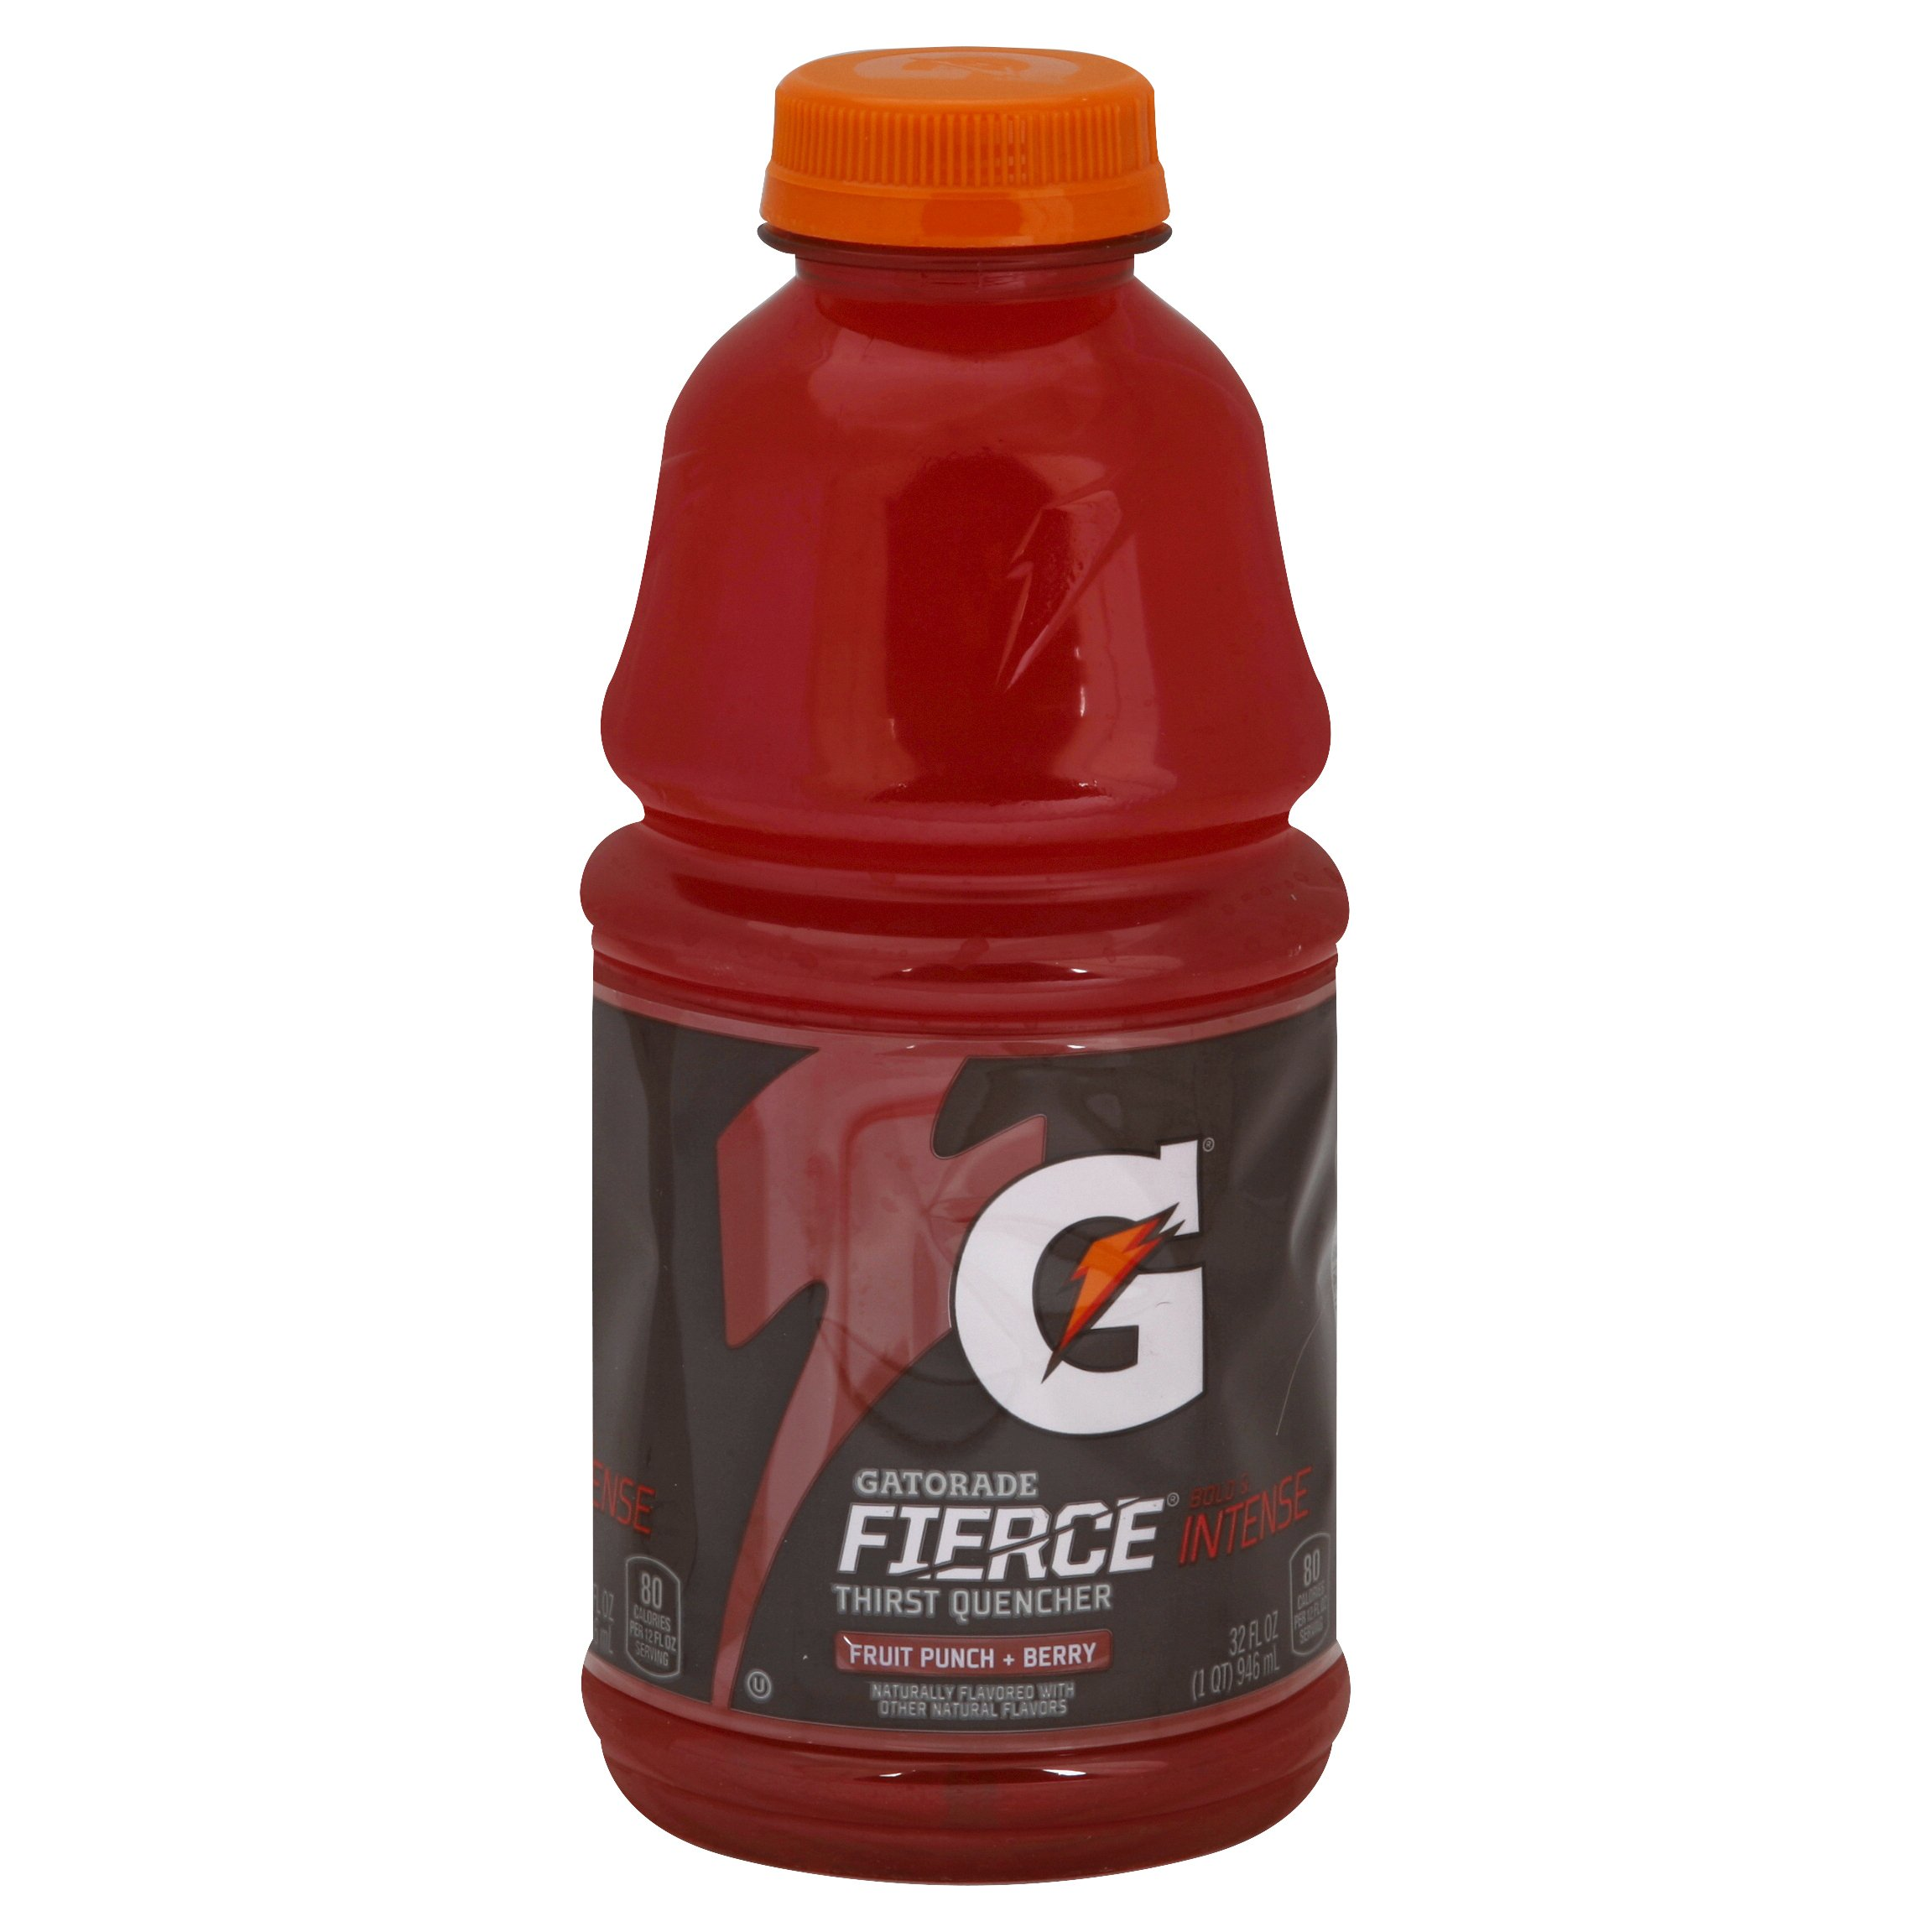 Gatorade Gatorade Fruit Punch & Berry Sports 32OZ 12-Pack